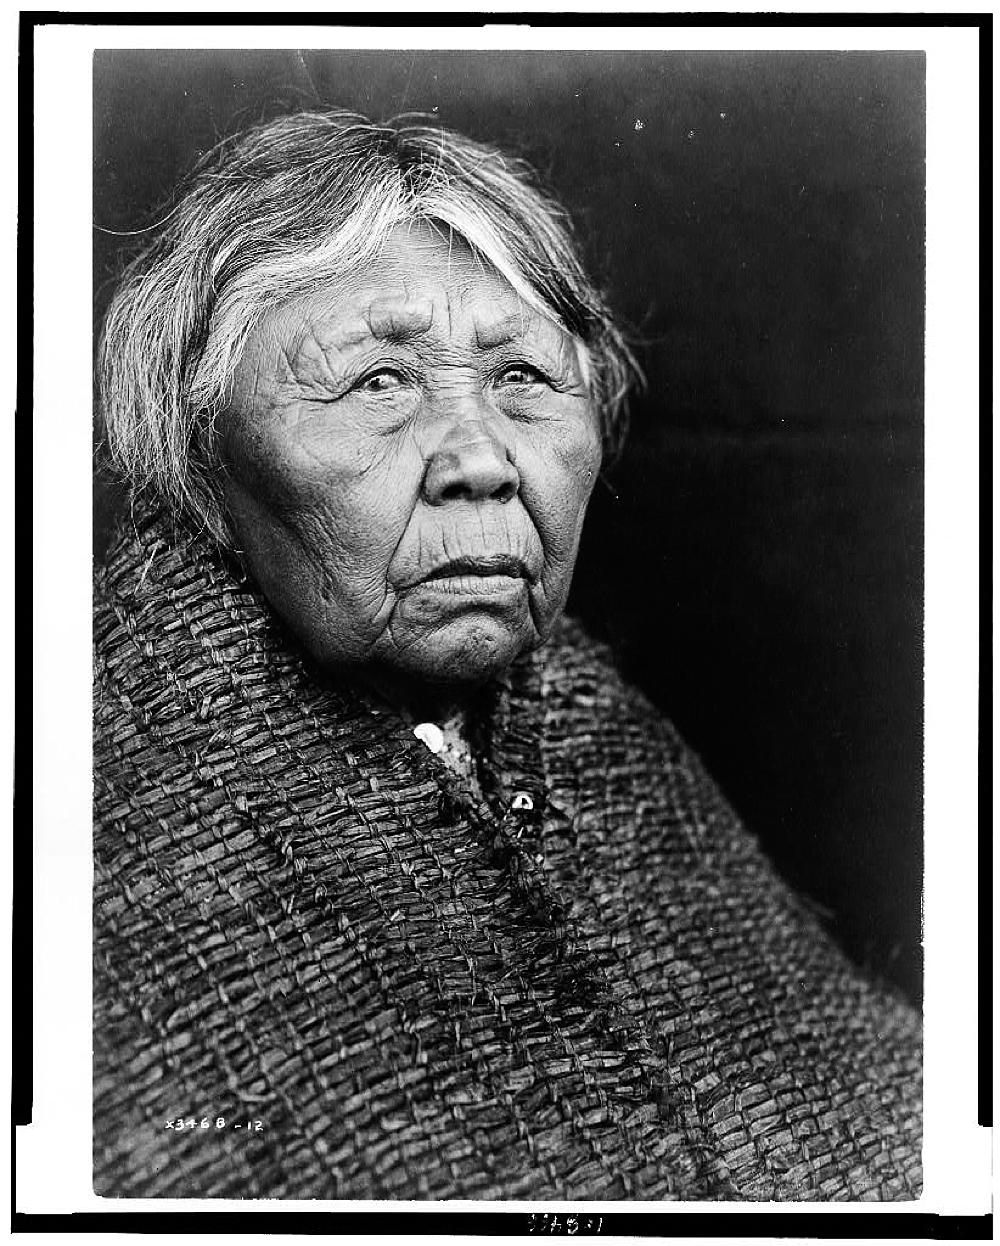 [Hleastunuh--Skokomish, Indian women, head-and-shoulders portrait, facing right]